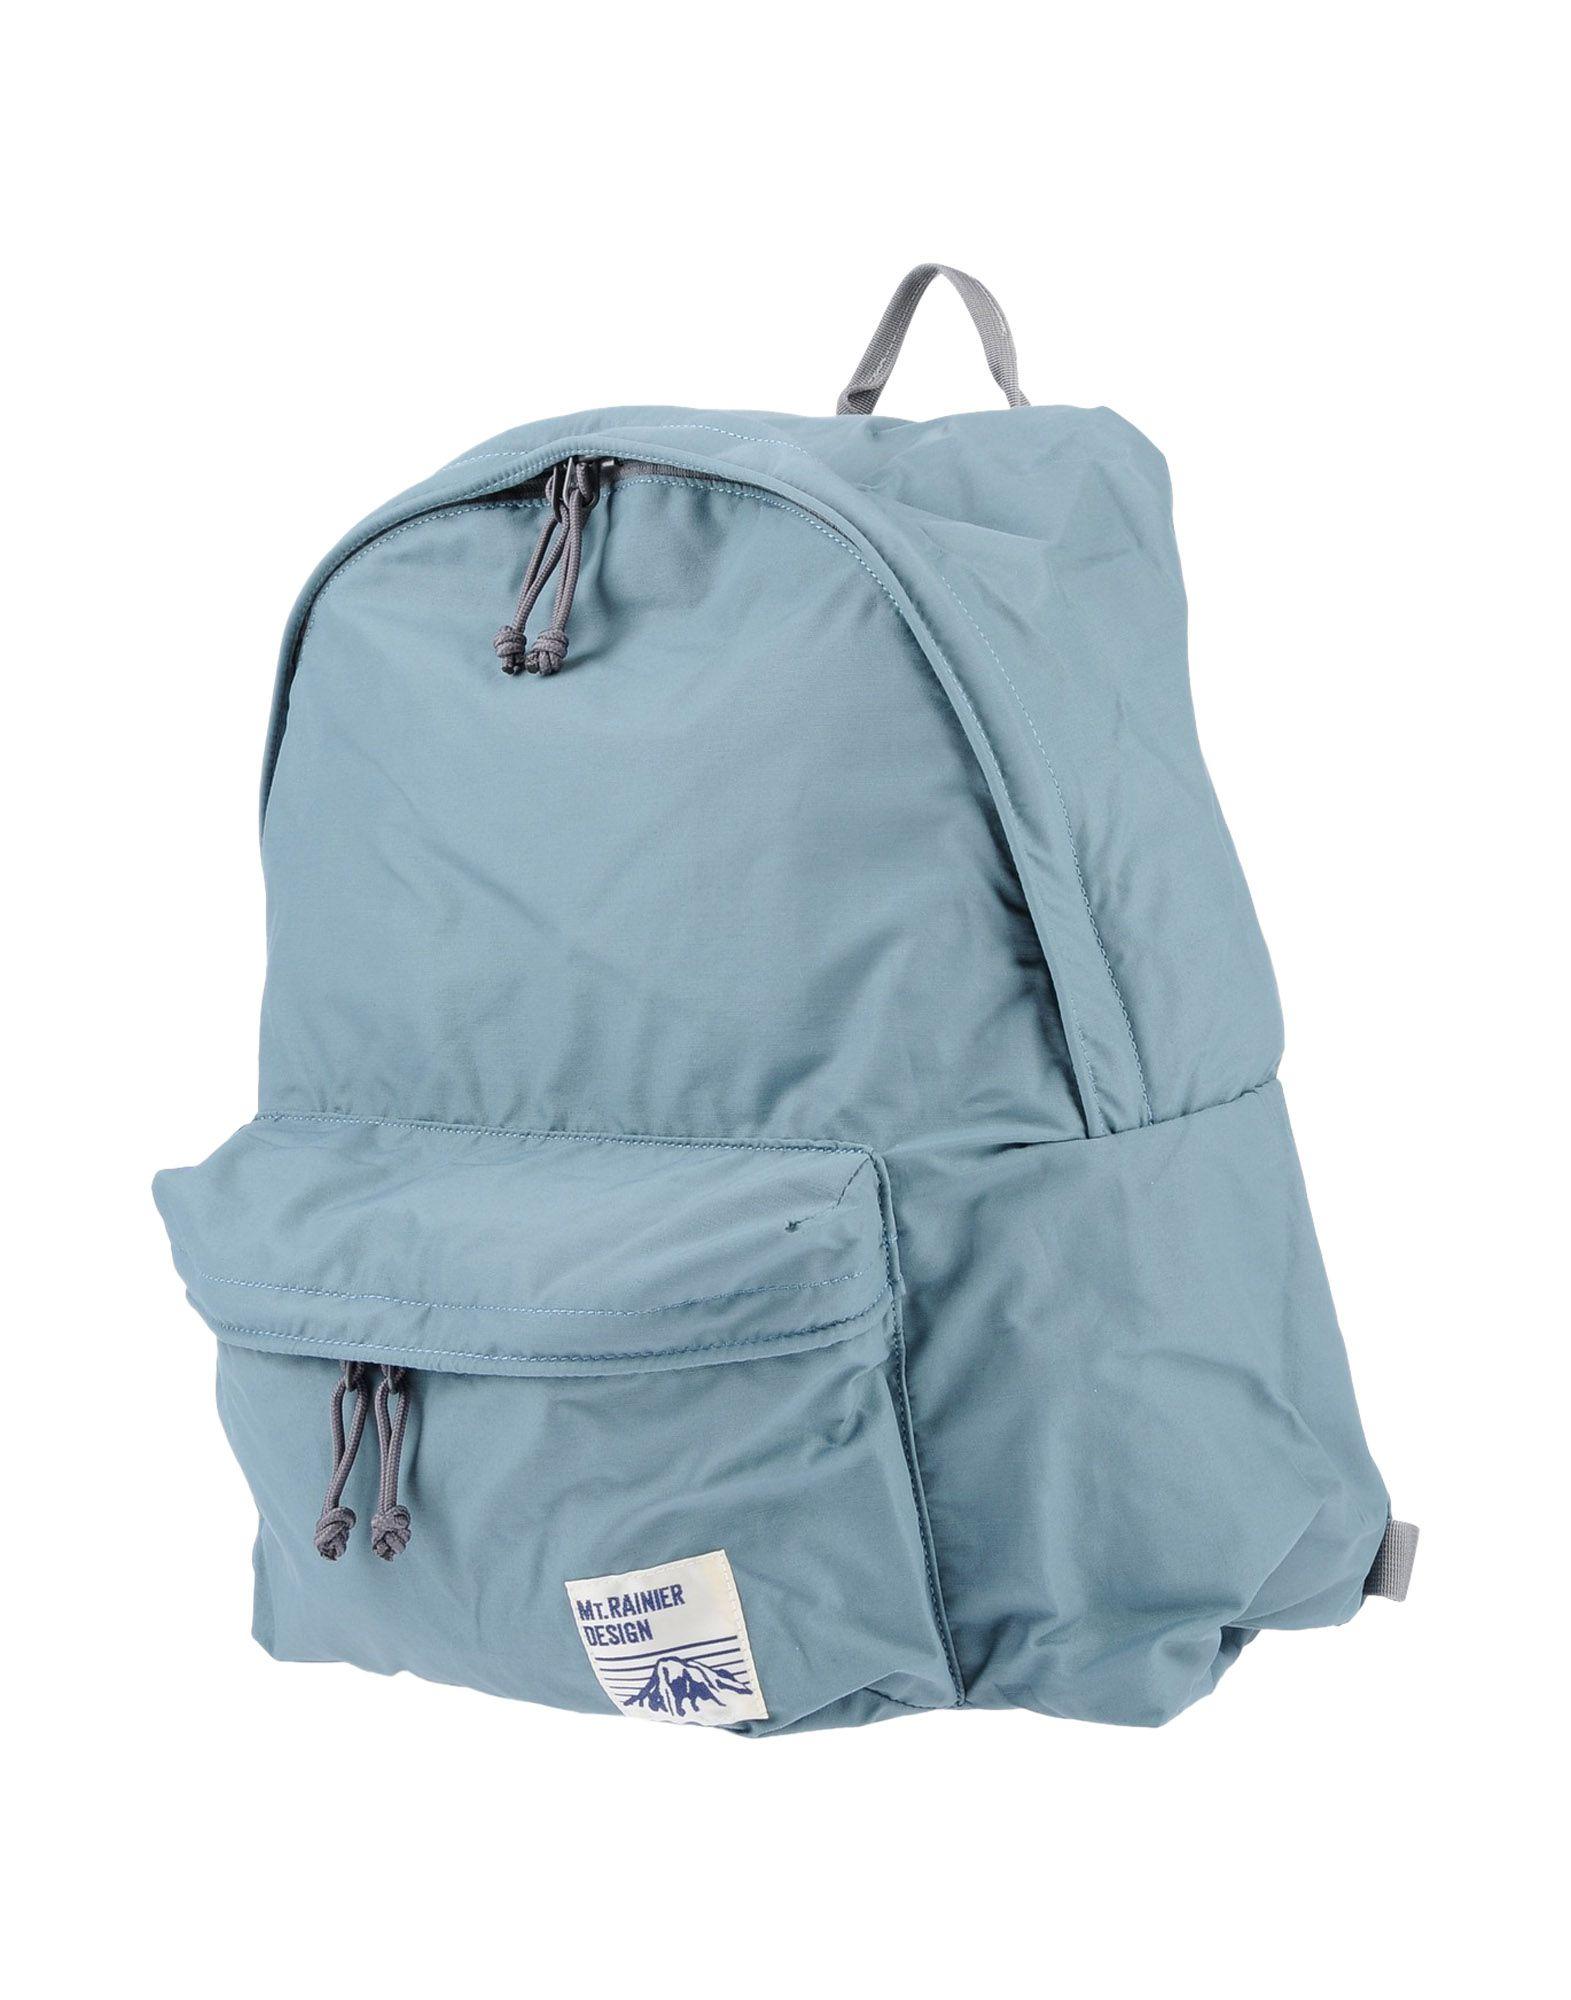 MT. RAINIER DESIGN Backpack & Fanny Pack in Grey